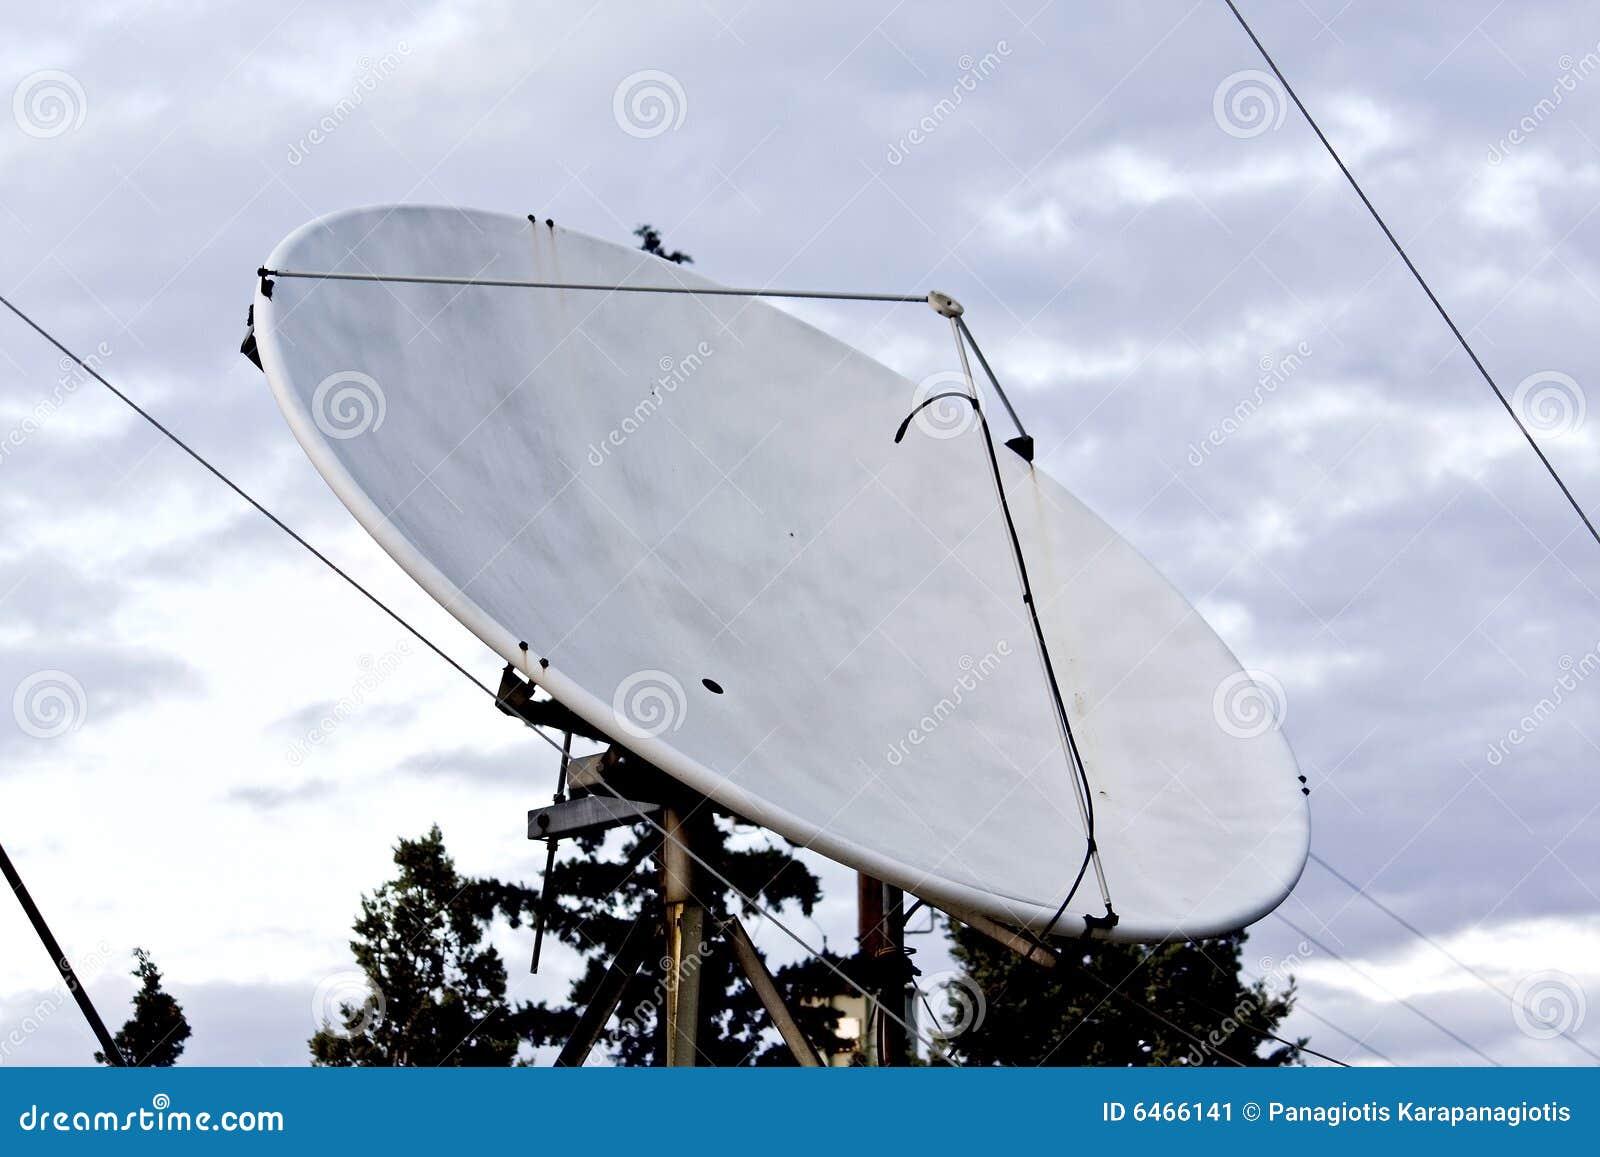 Satellite dish used for SAT TV